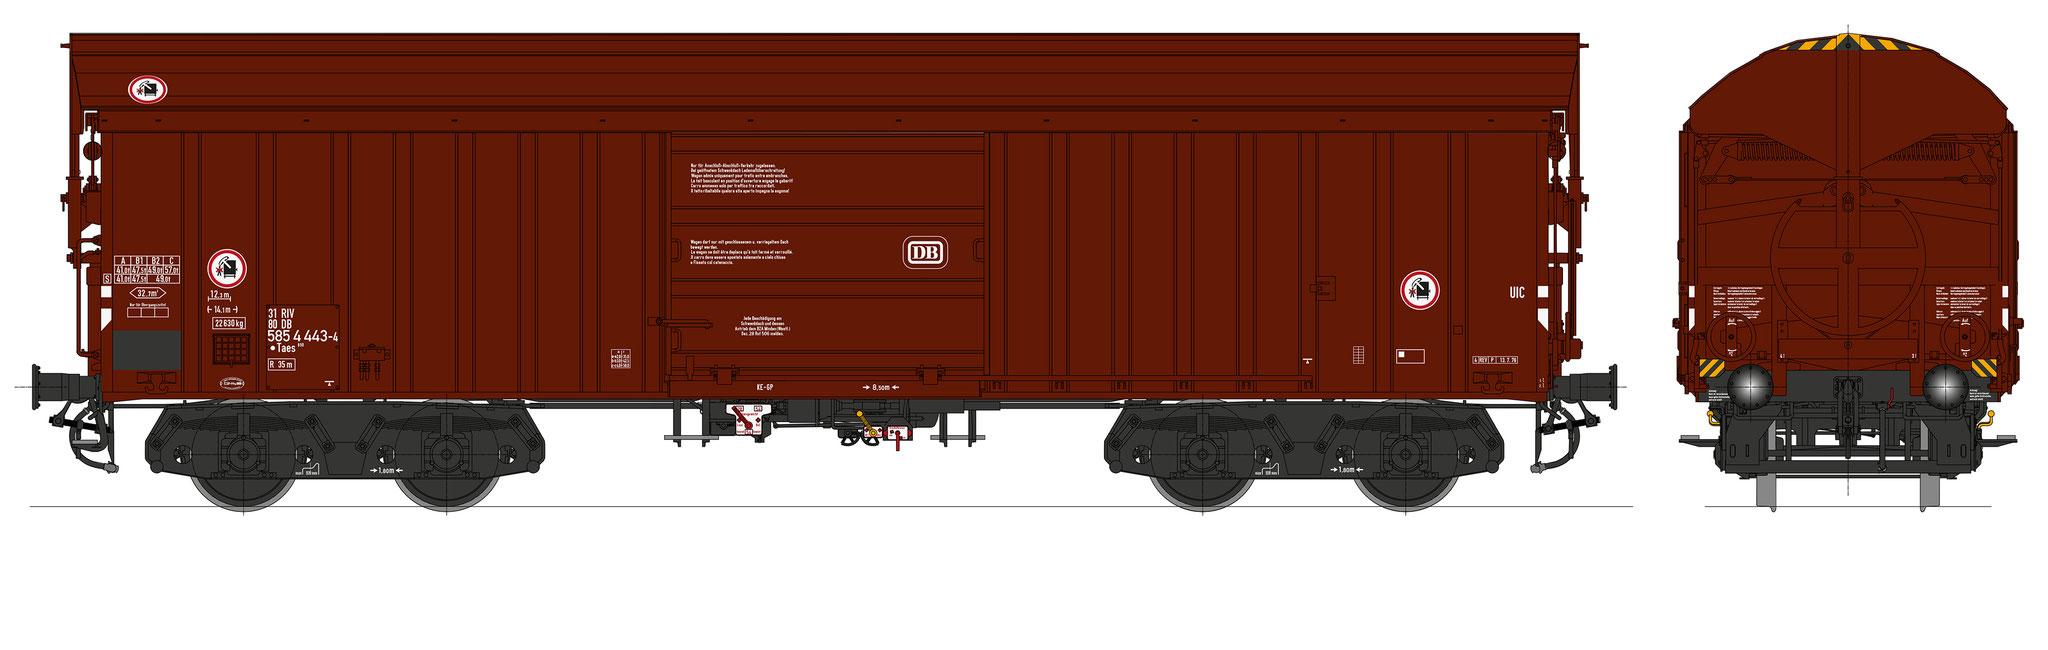 Bestell-Nr. 16063, Ep. 4b, Fahrgestell schwarz